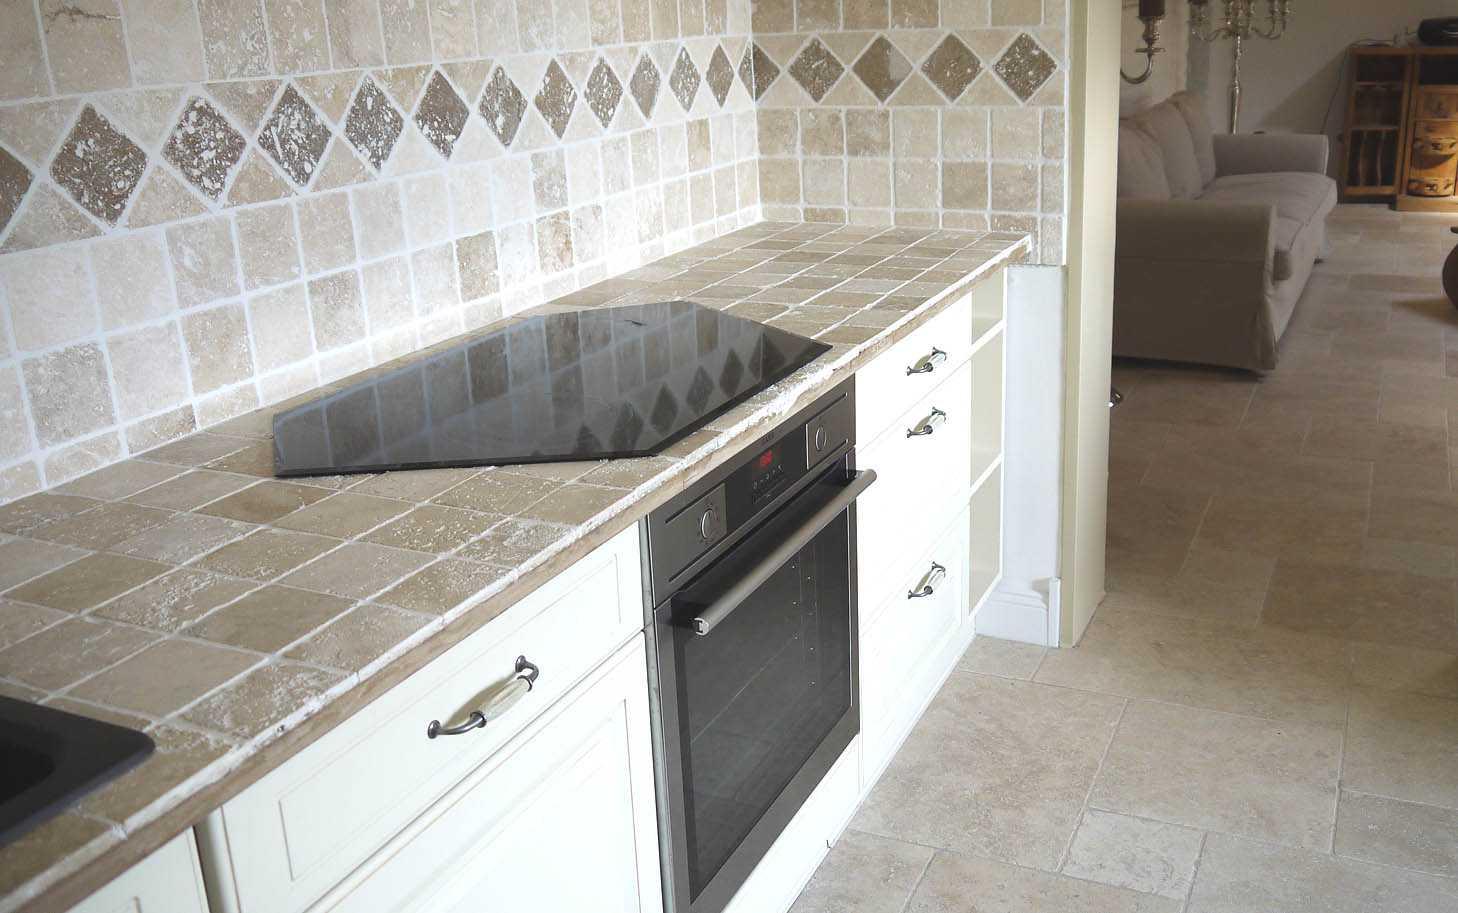 Full Size of Bodenbelag Küche Gastronomie Bodenplatten Küche Küchenboden Modern Welcher Bodenbelag In Küche Wohnzimmer Küche Bodenbelag Küche